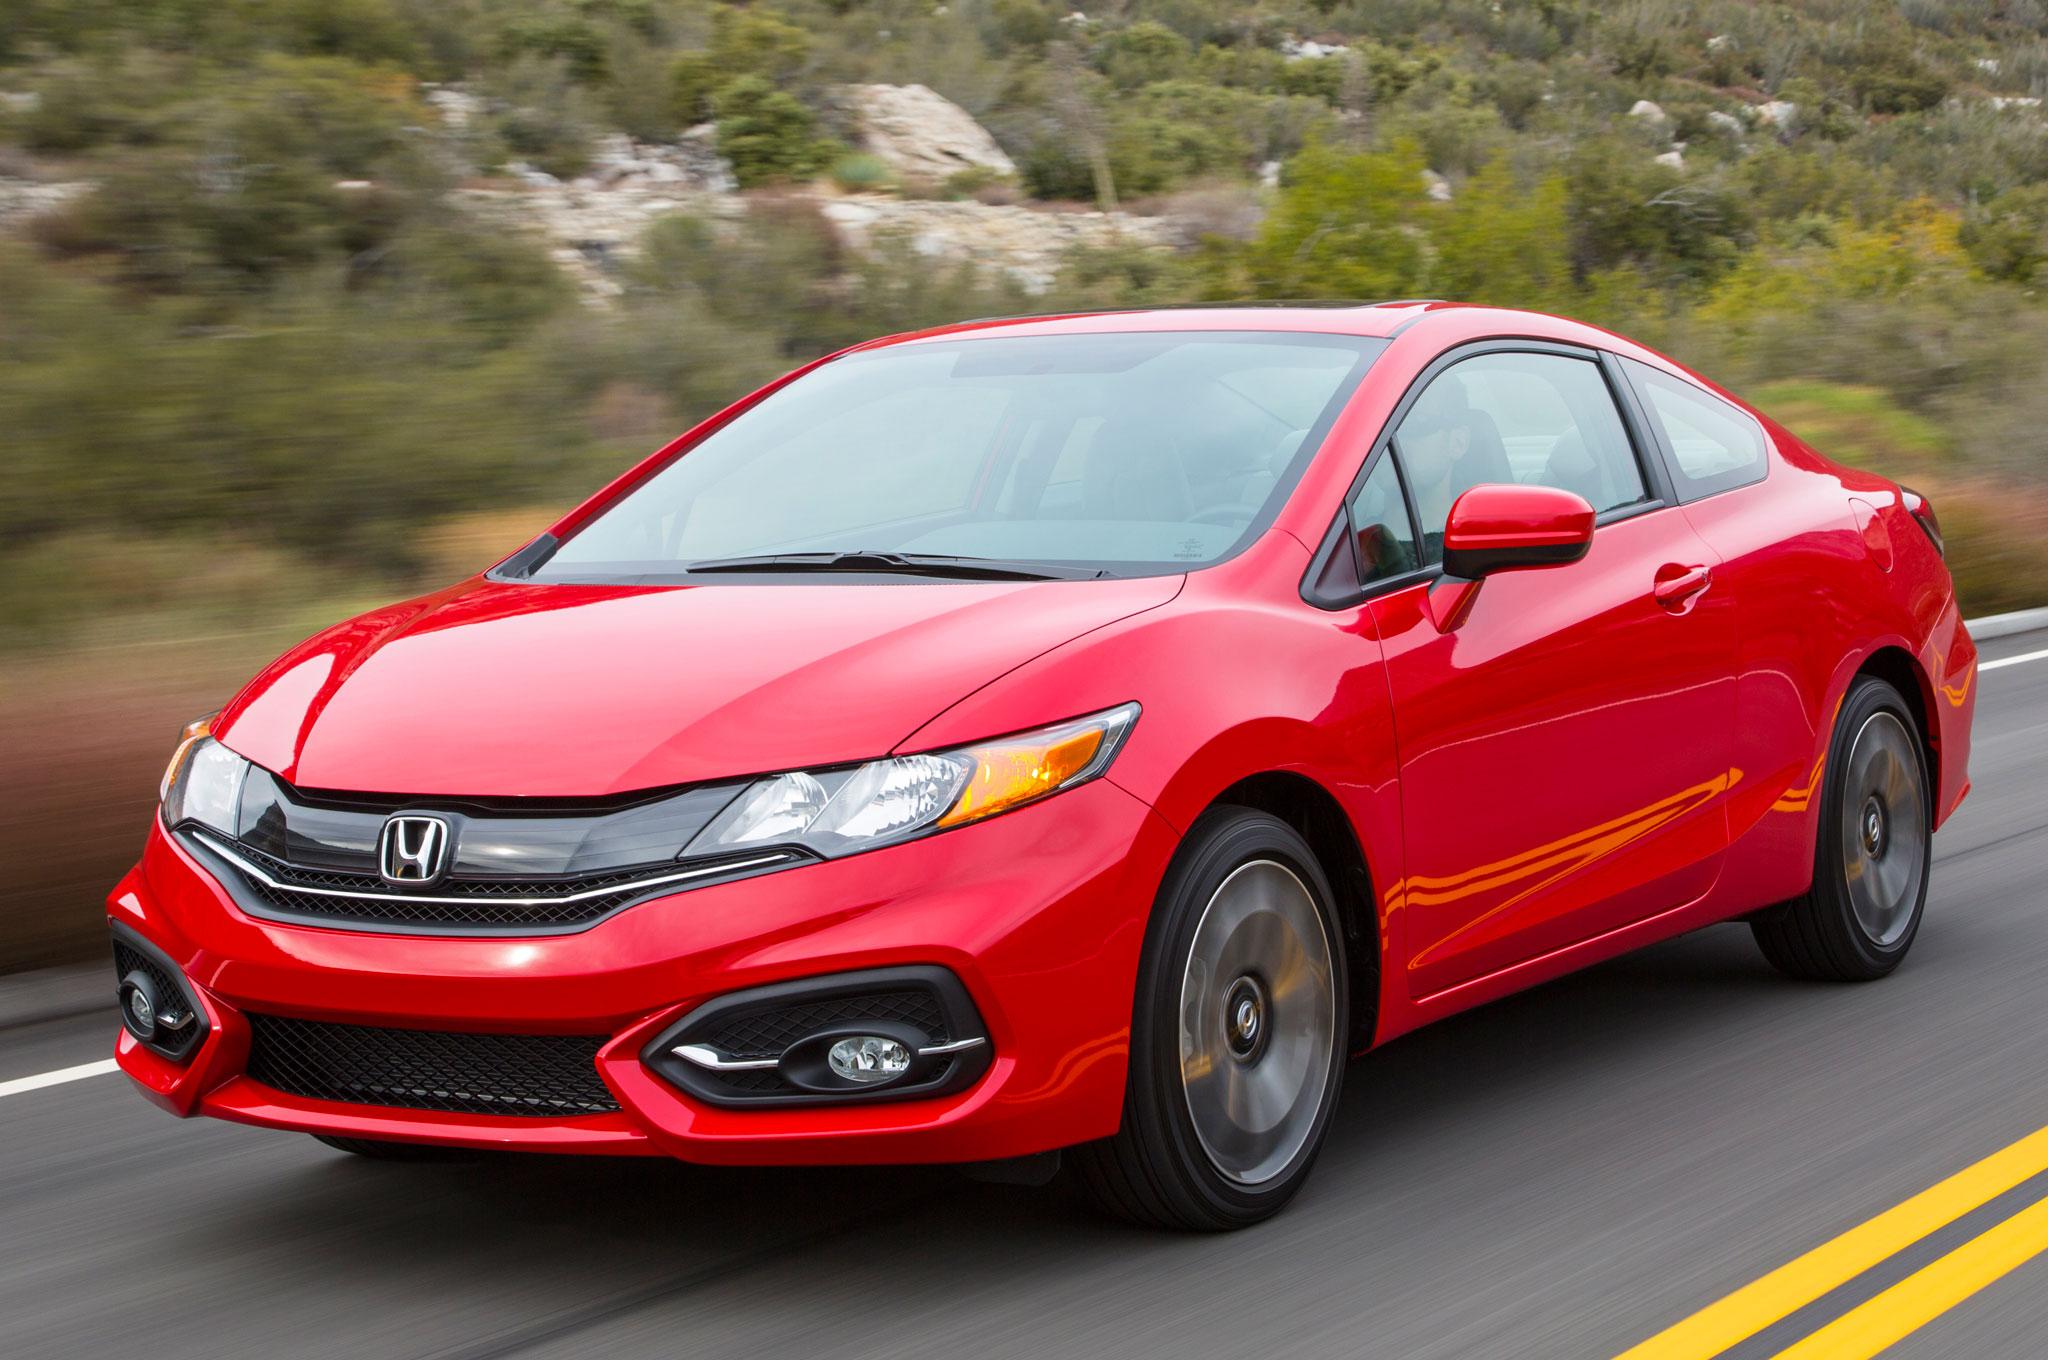 2015 Honda Civic Si Gets Modest Price Increase